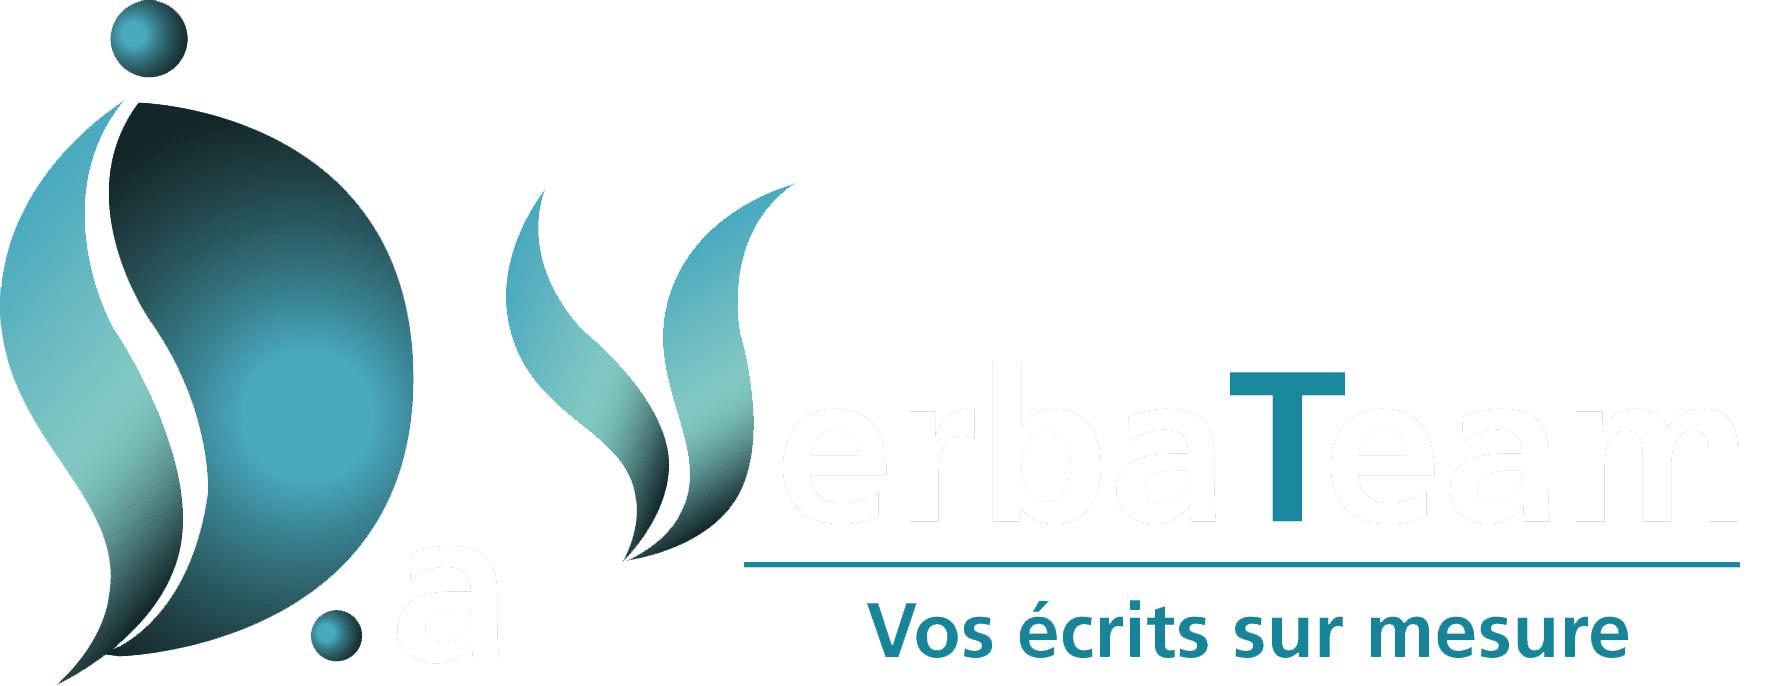 idvt logo